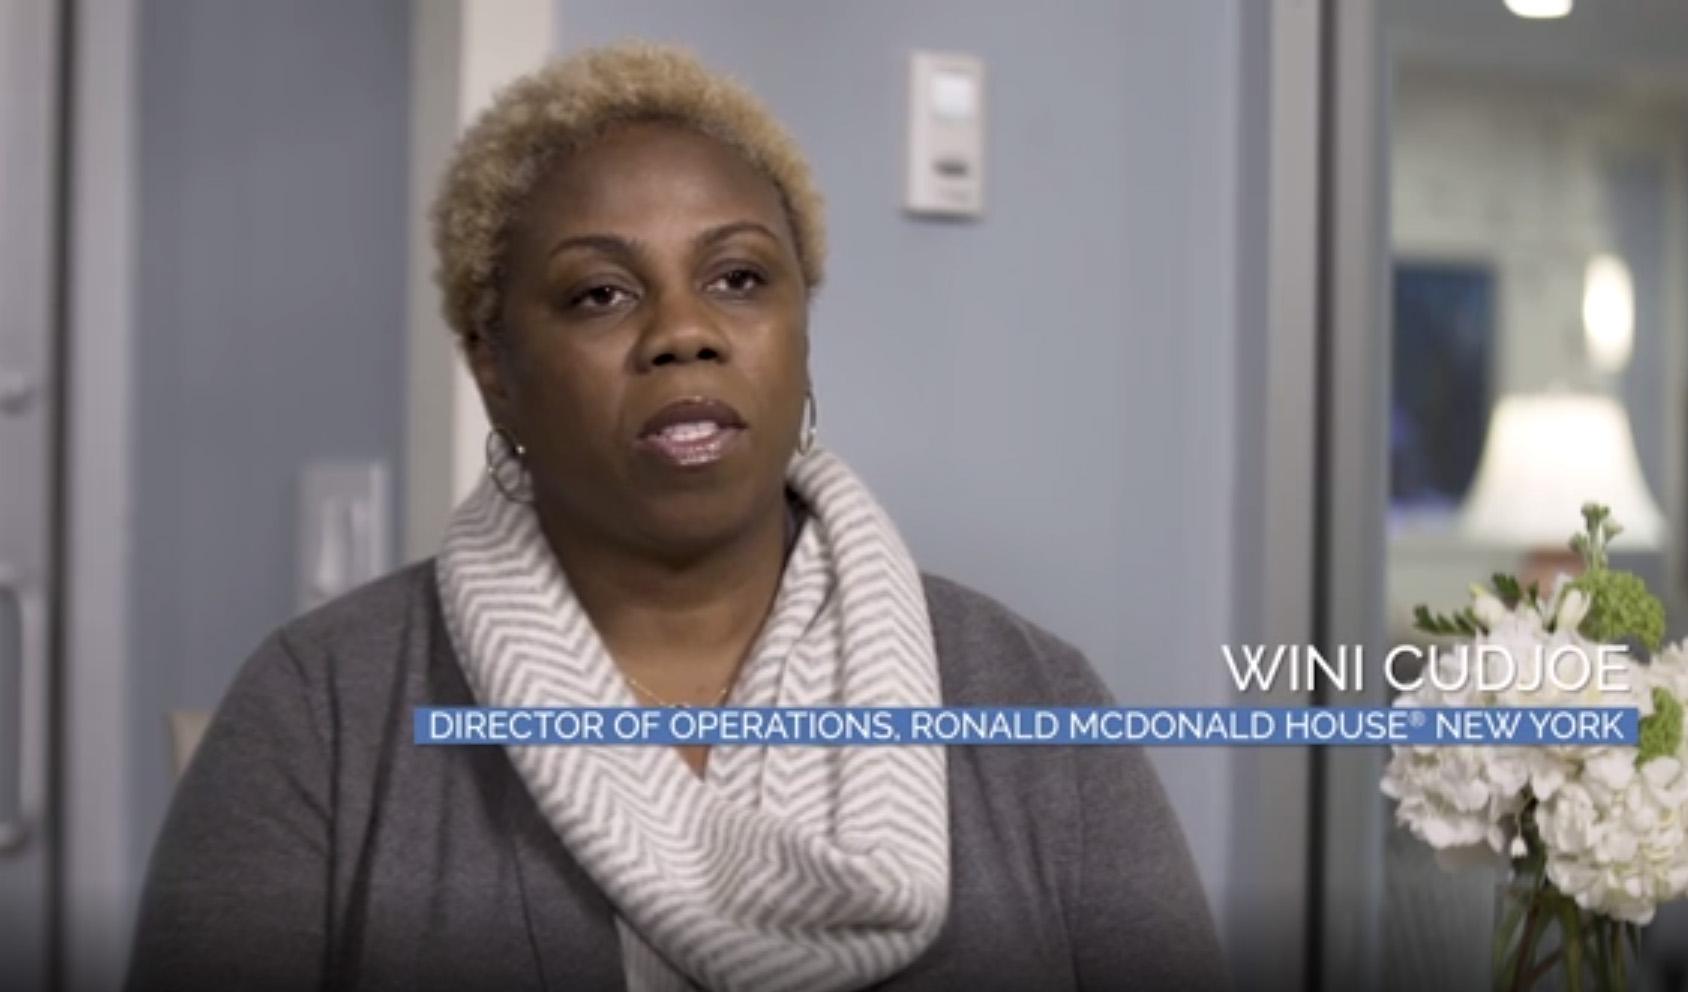 Meet The Ronald McDonald House New York Staff